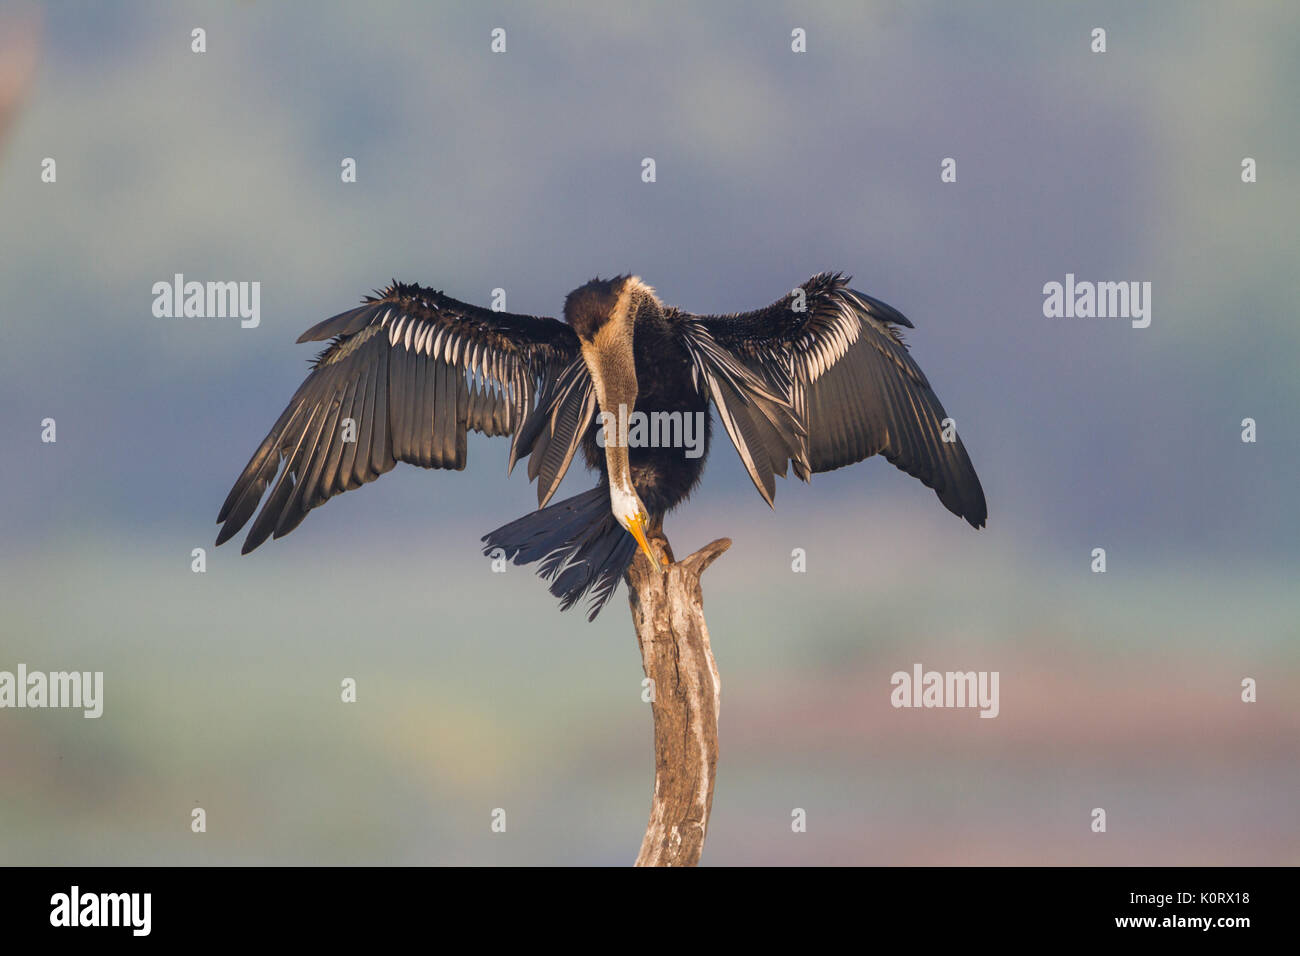 The Oriental darter or Indian darter (Anhinga melanogaster) preening itself by the lake at Bharatpur Bird Sanctuary, Rajasthan, India - Stock Image